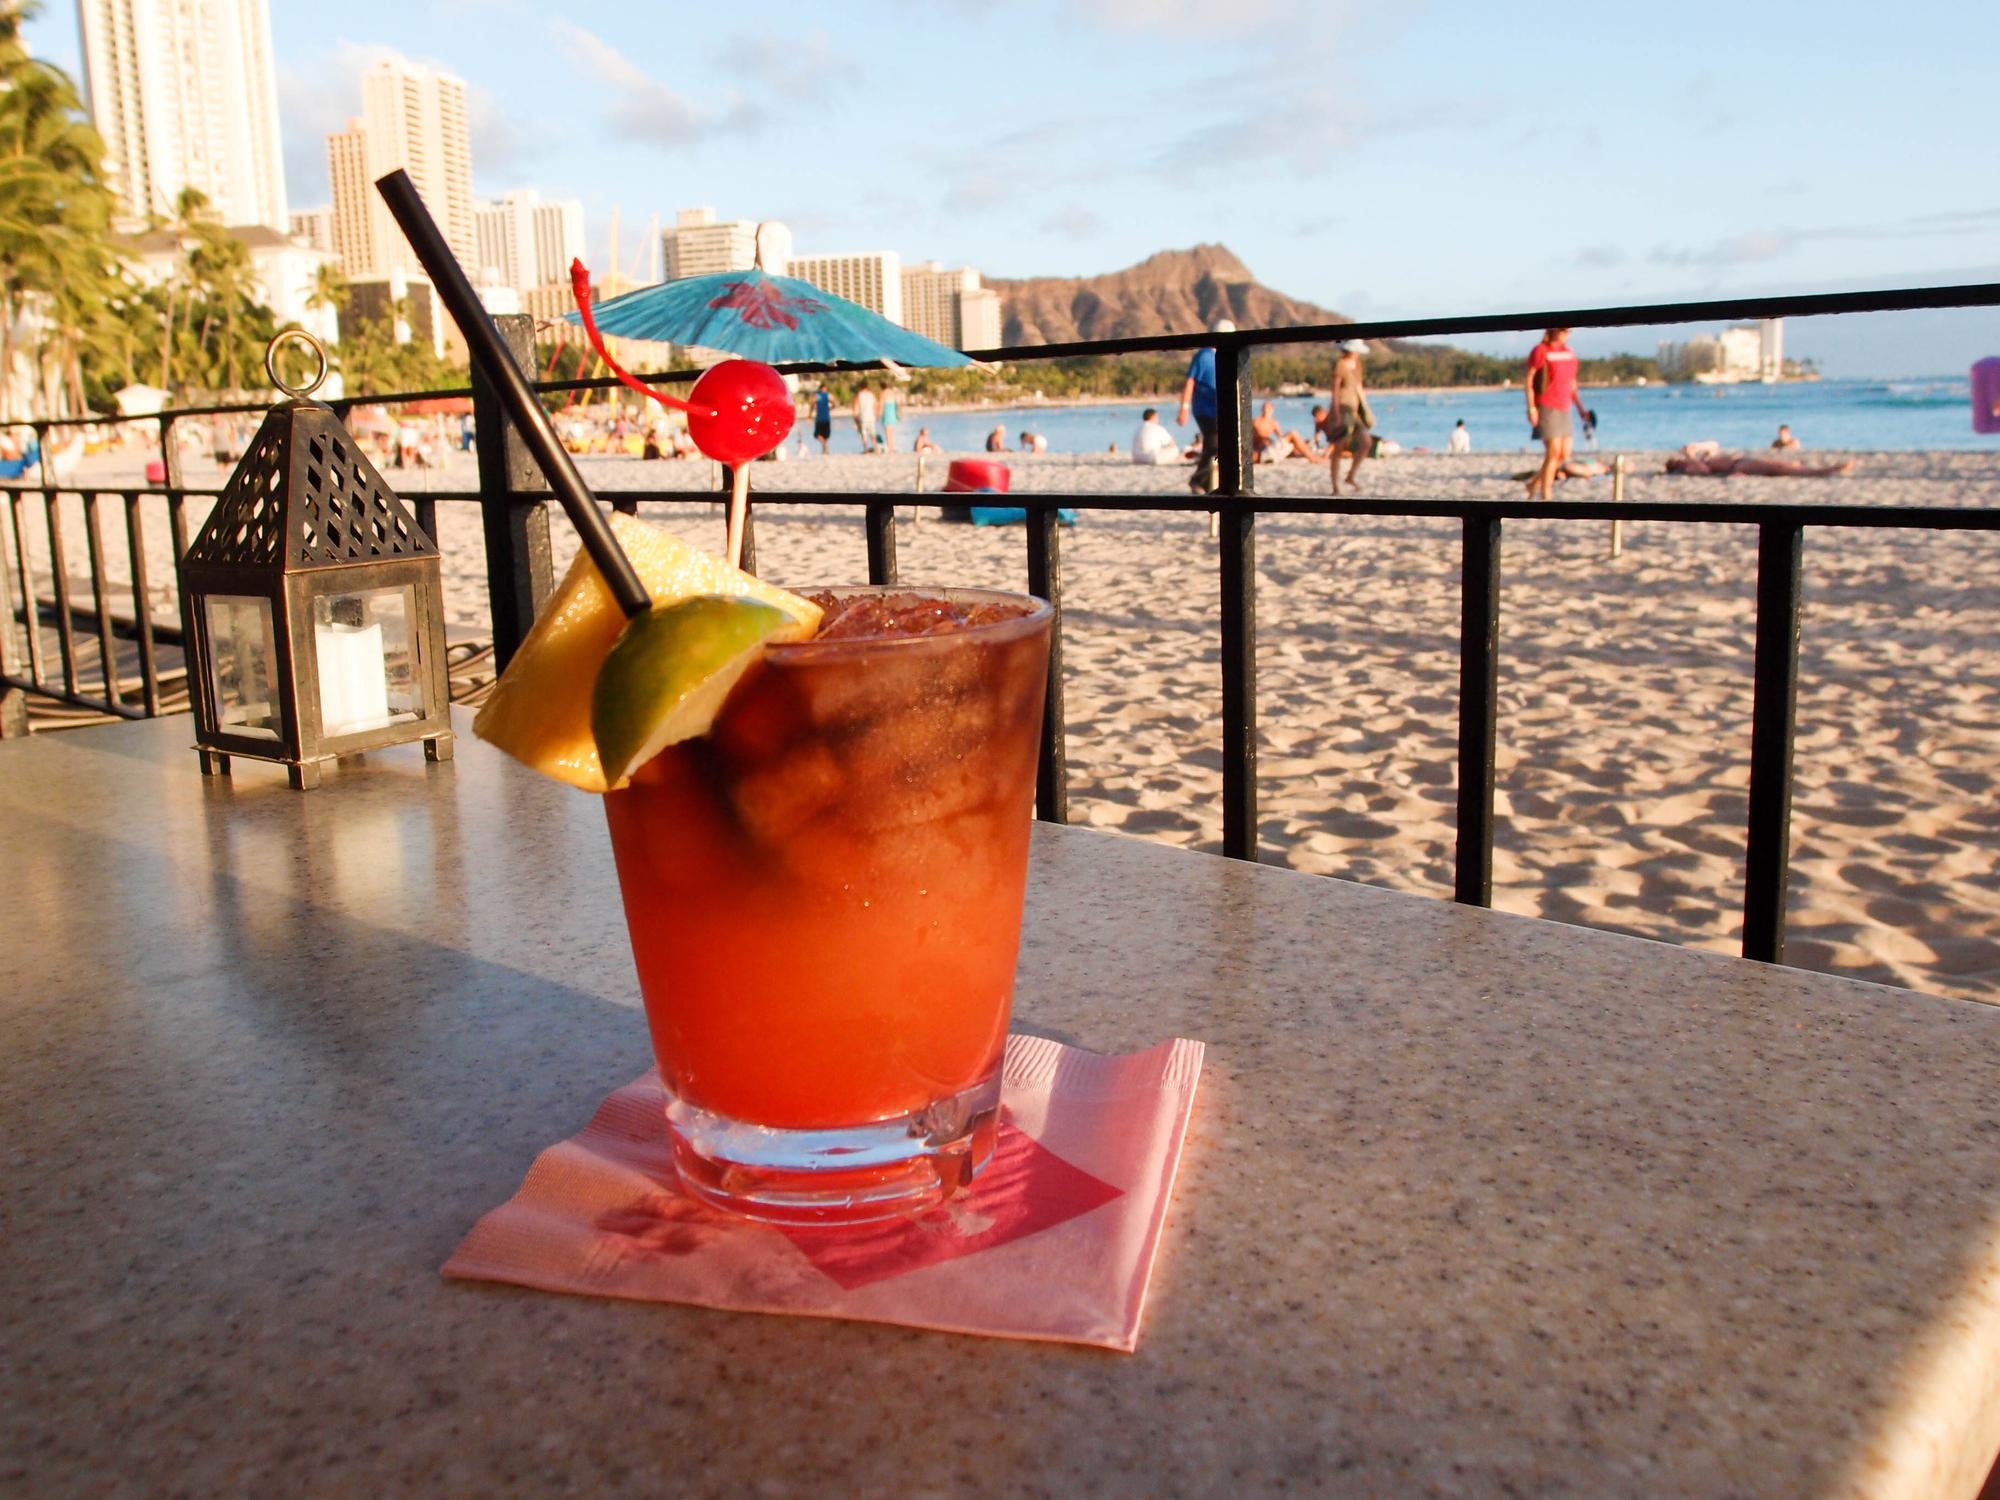 mai tai cocktail at beach in Hawaii